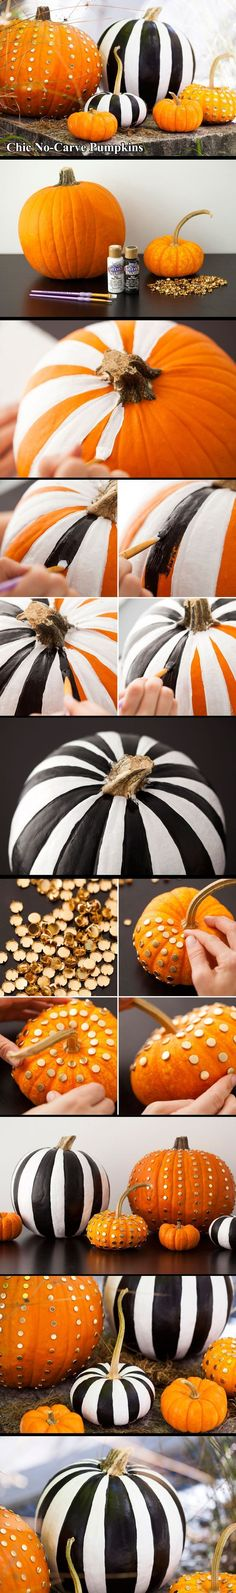 DIY: 2 Ways to Make Chic No-Carve Pumpkins via Brit + Co. Halloween with Tim Burton ~~ Halloween Party Decorations & Ideas